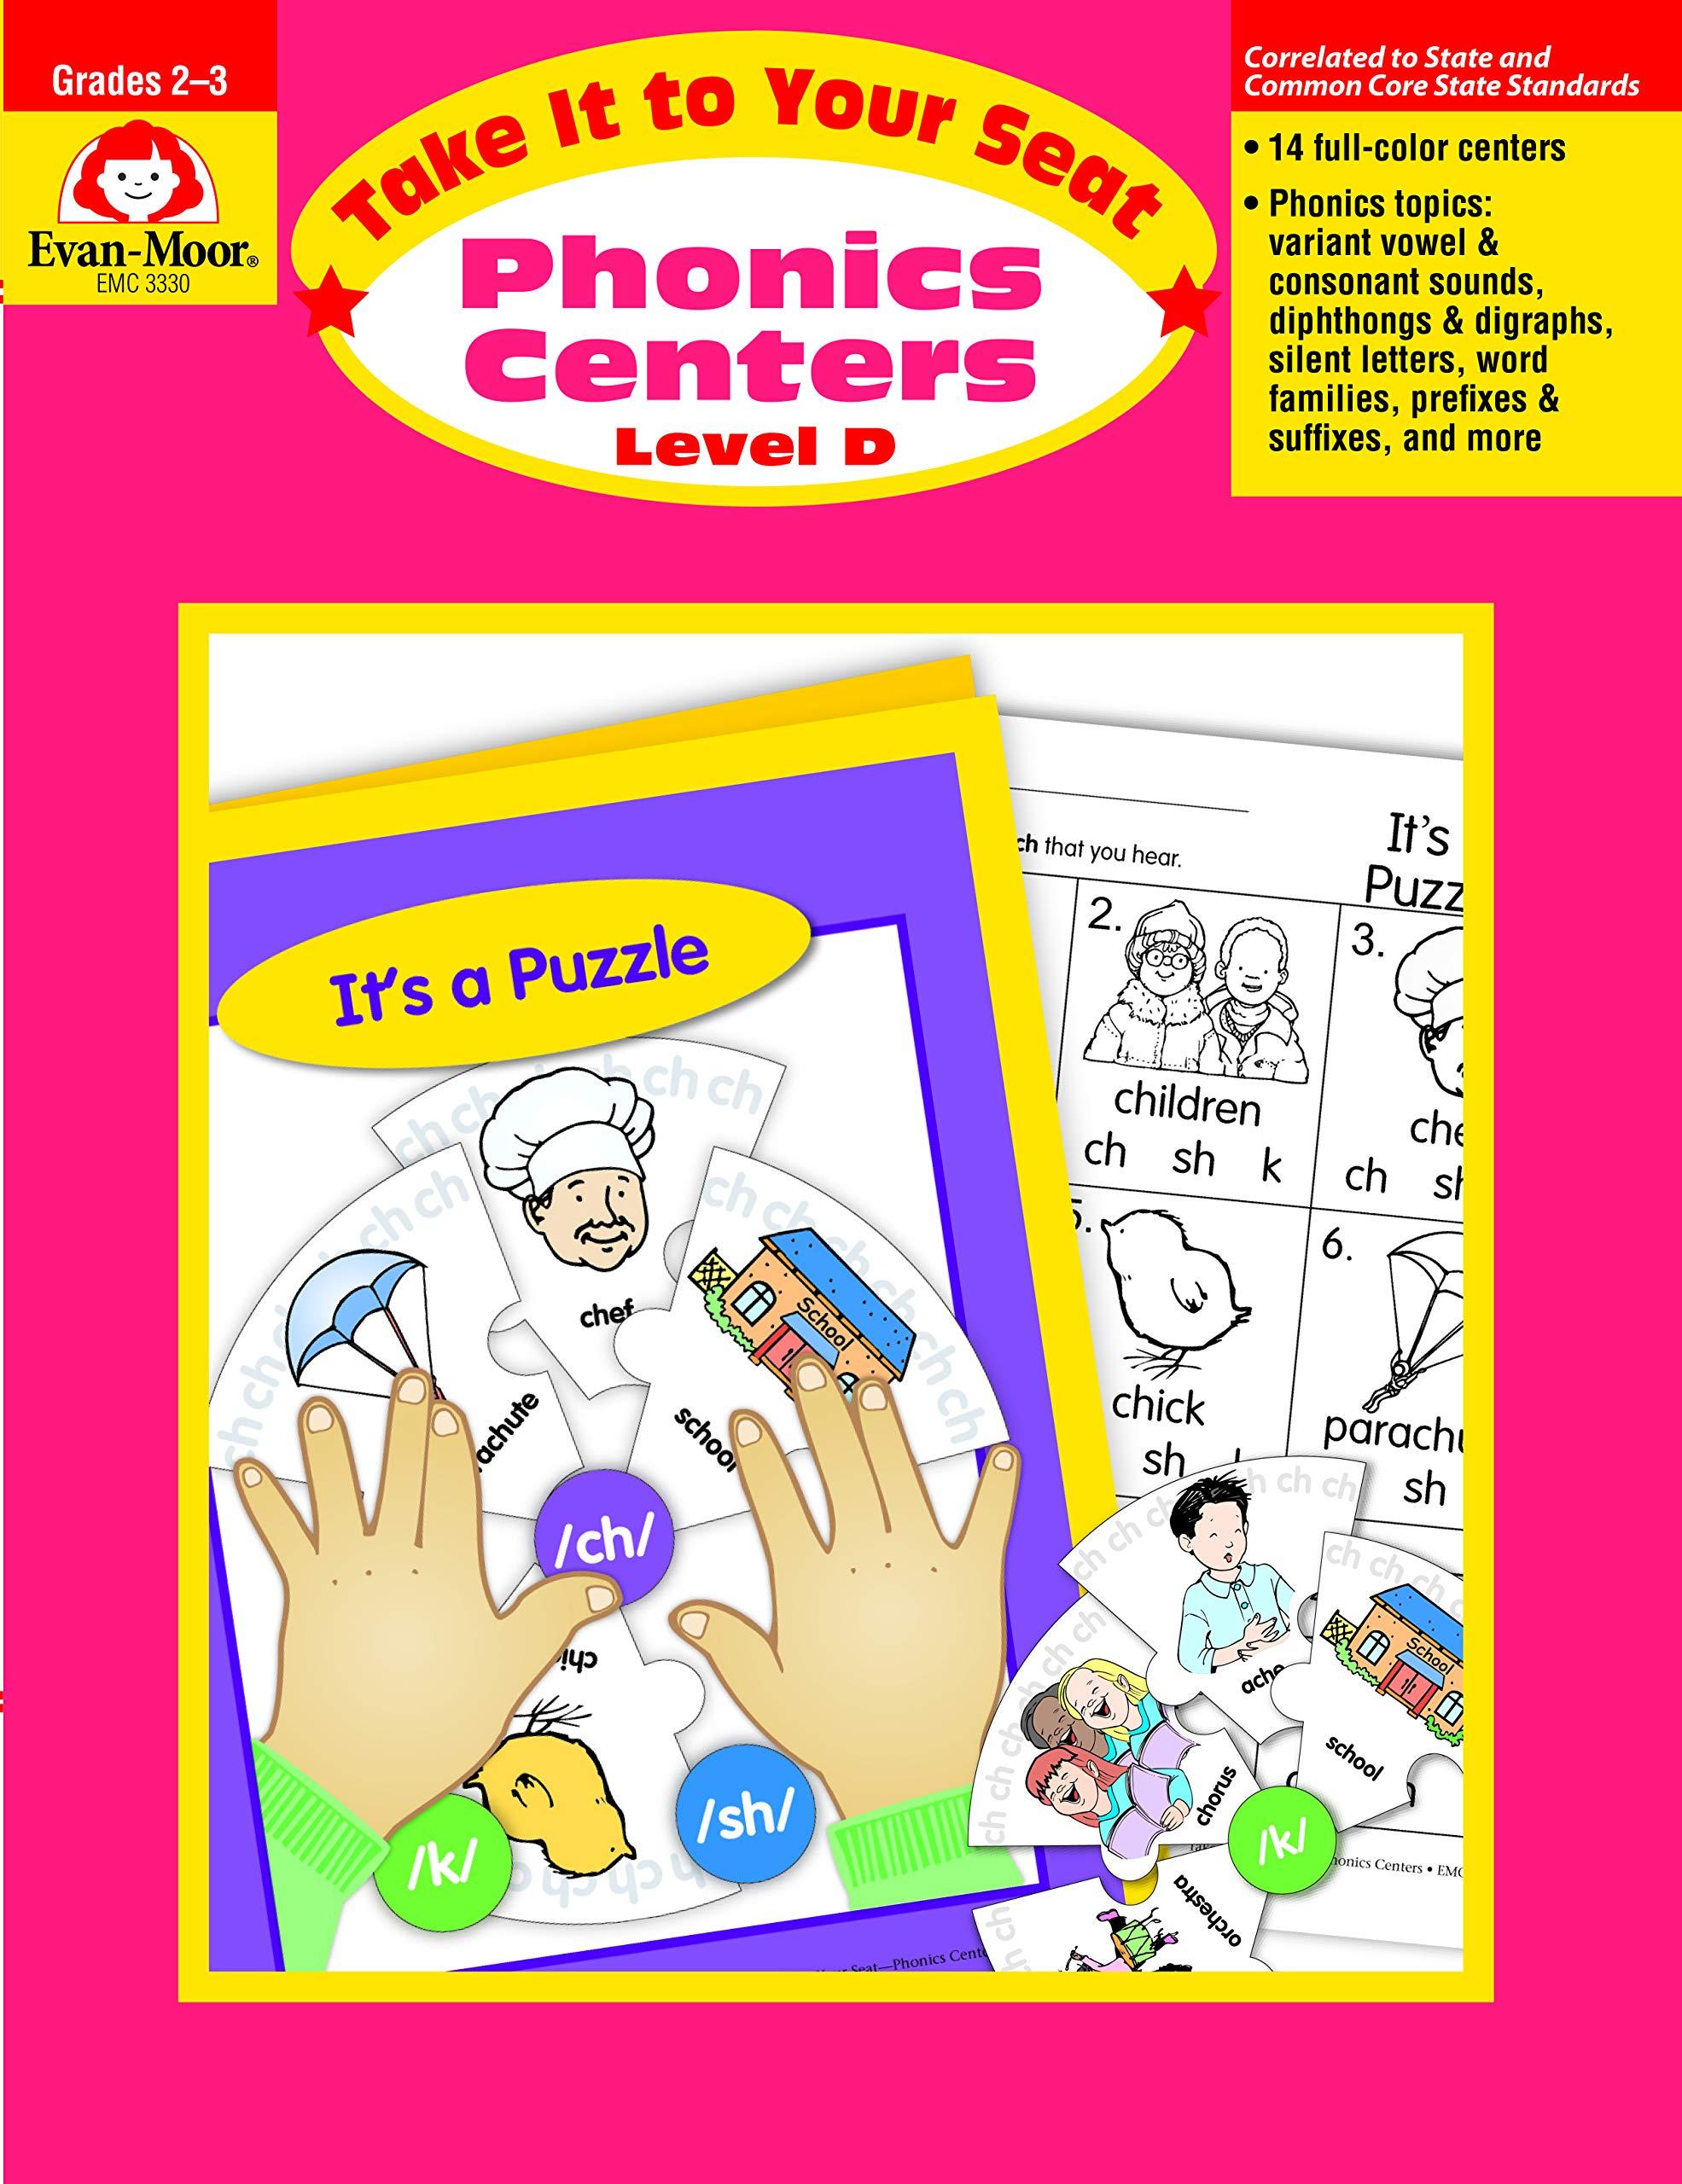 Phonics Centers Grades 2-3